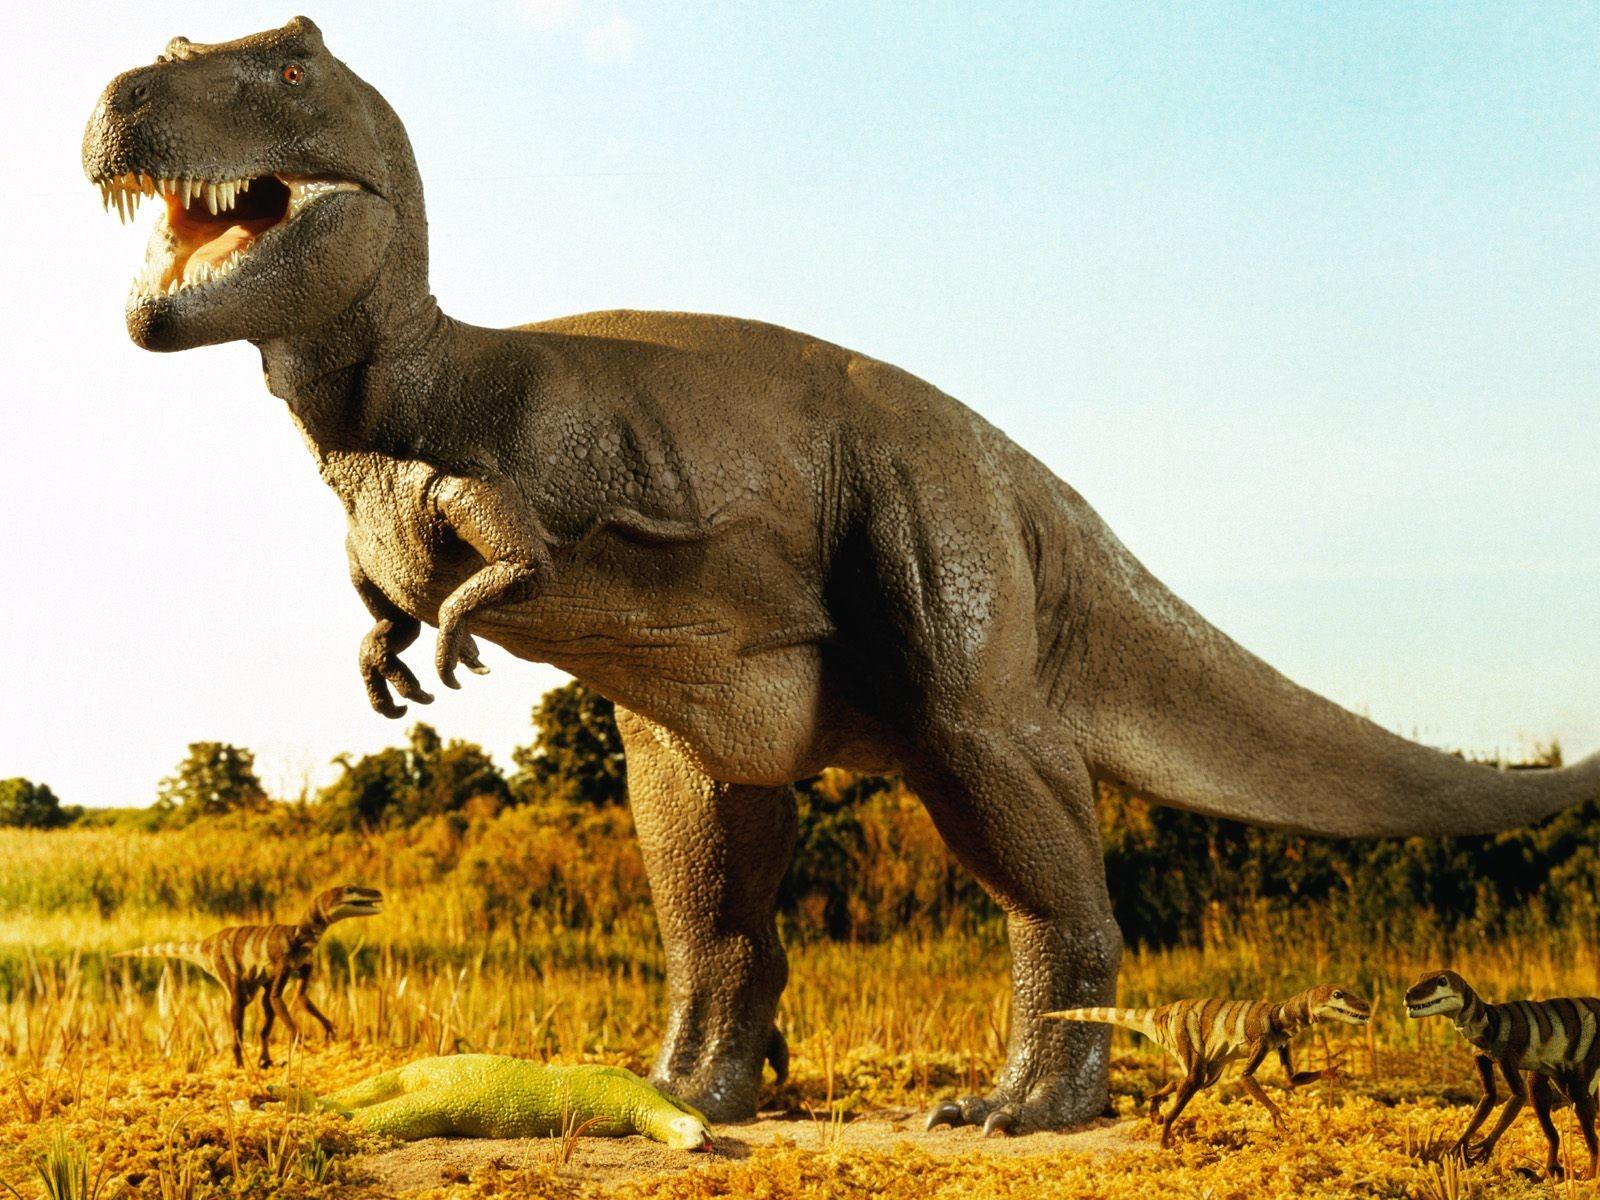 dinosaur hd wallpapers images for dinosaur hd dinosaur wallpapers full 1600x1200